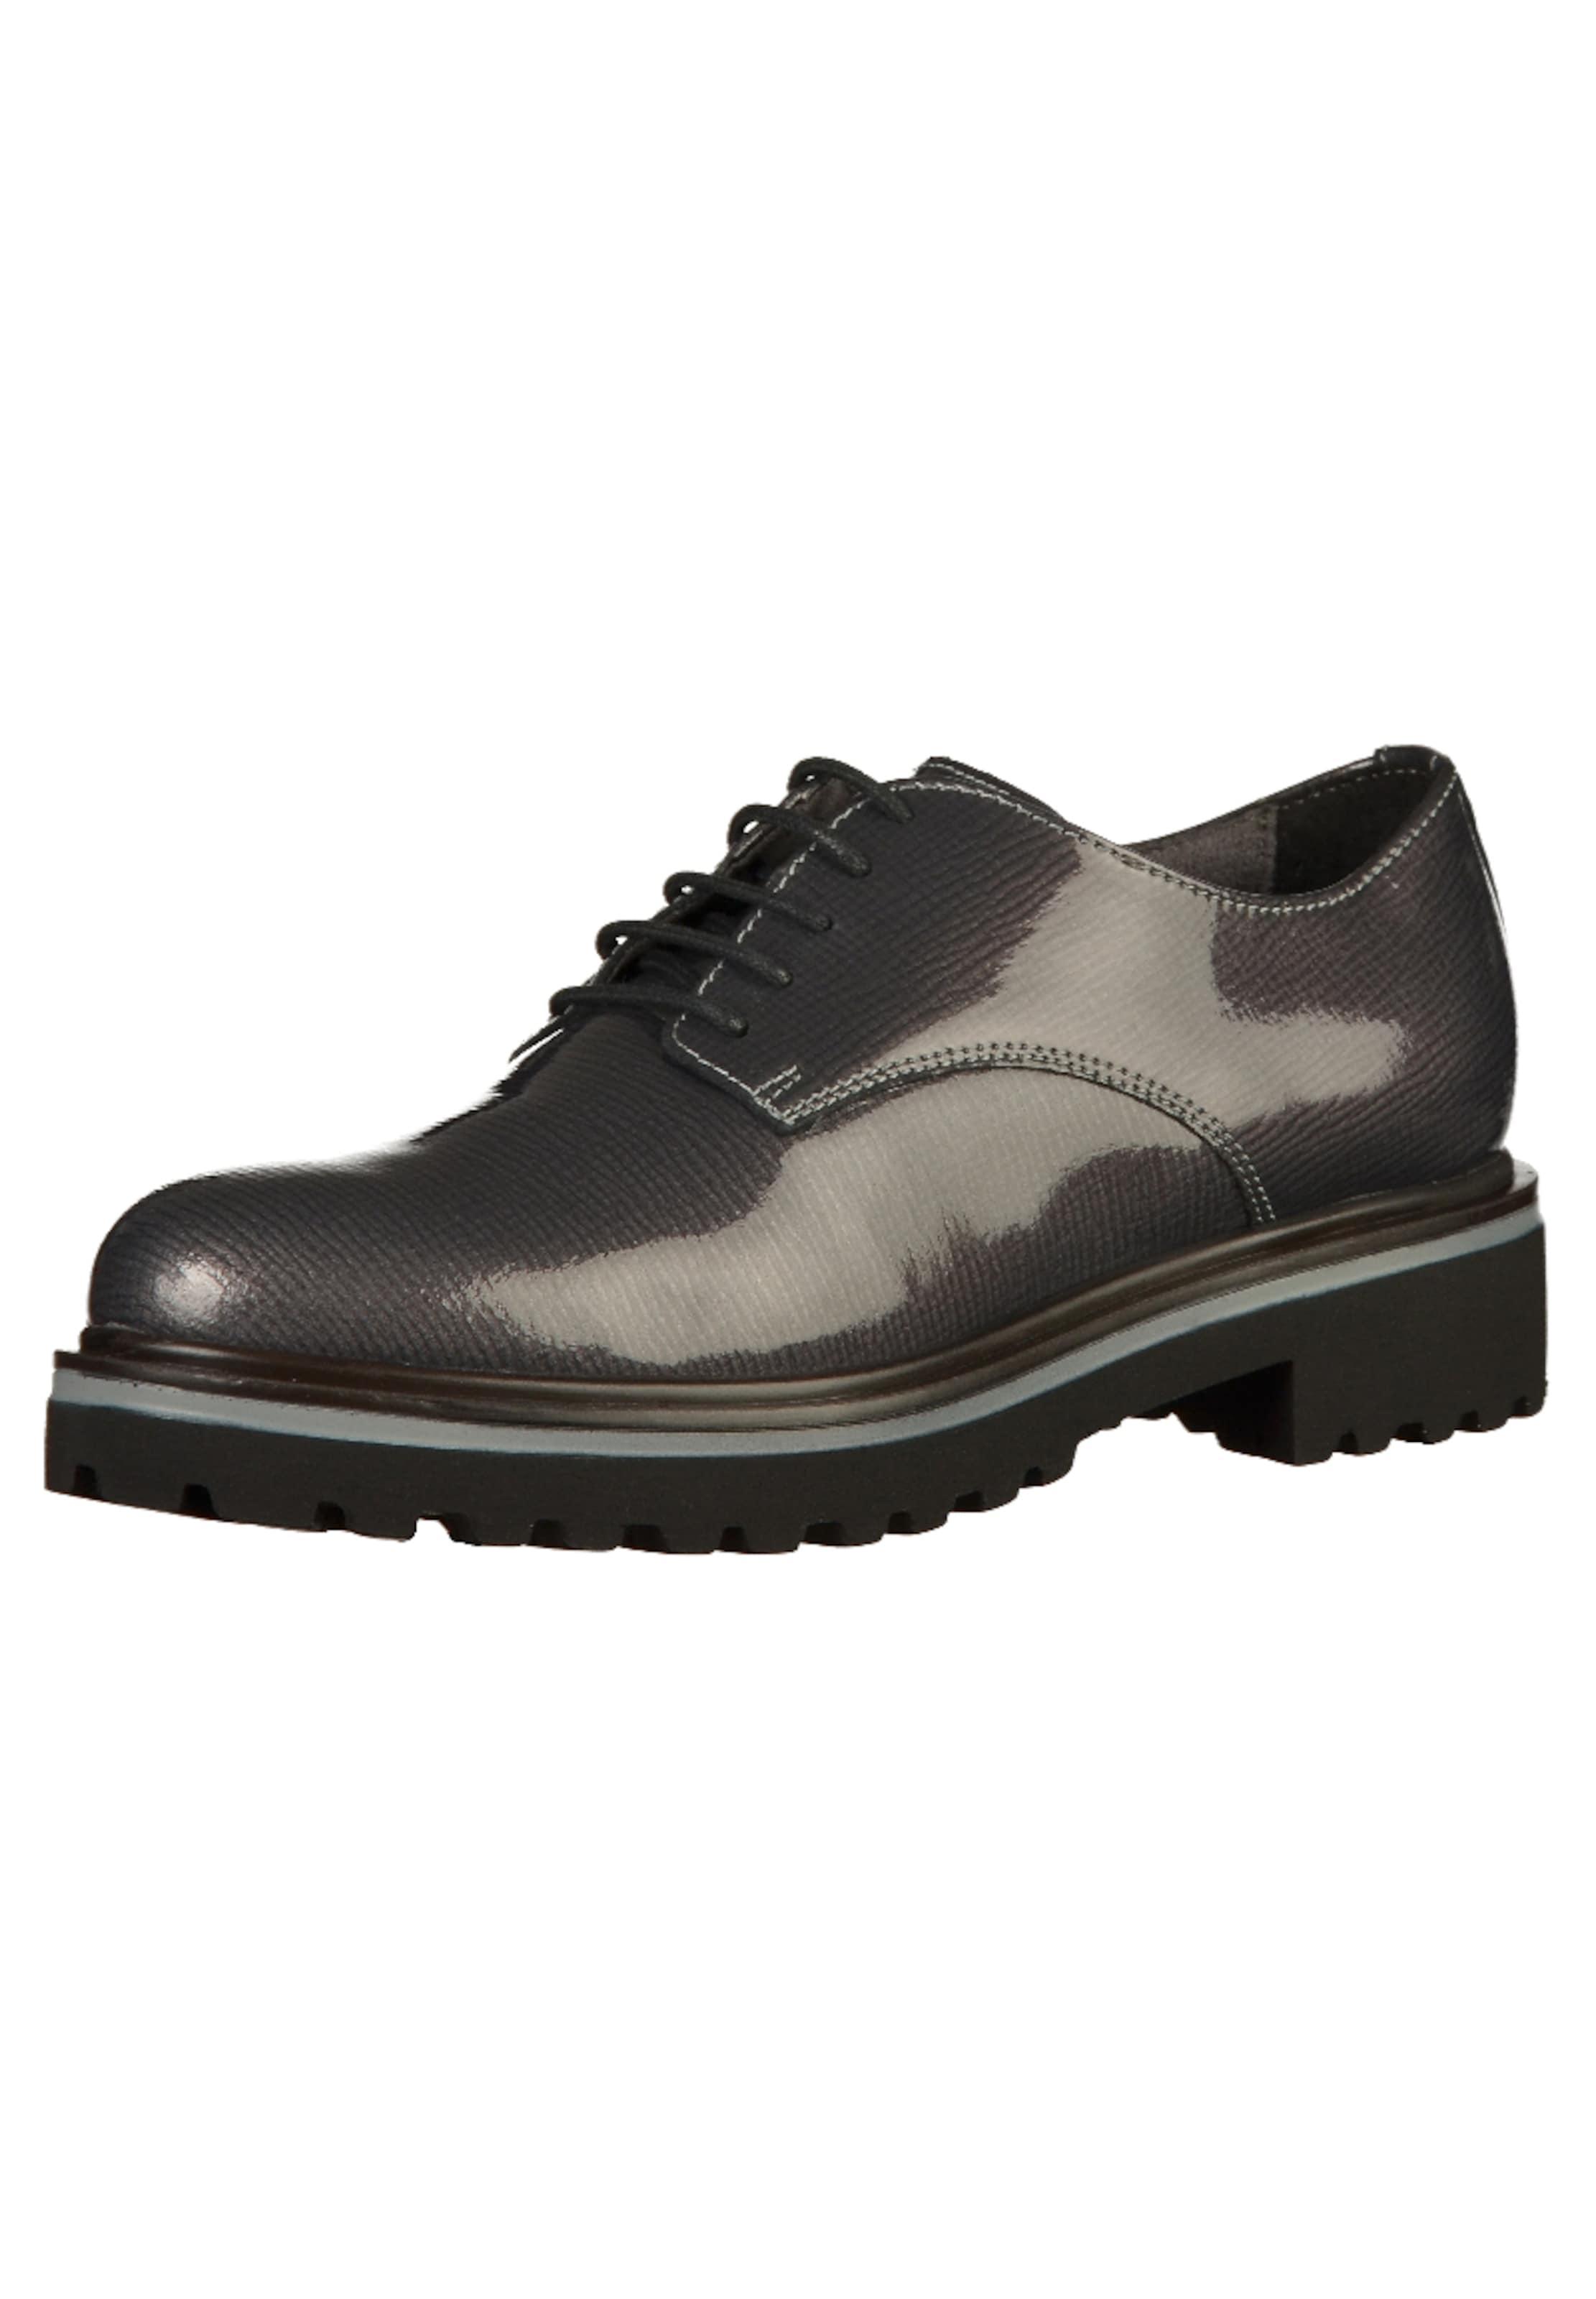 MARCO TOZZI Halbschuhe Günstige und langlebige Schuhe